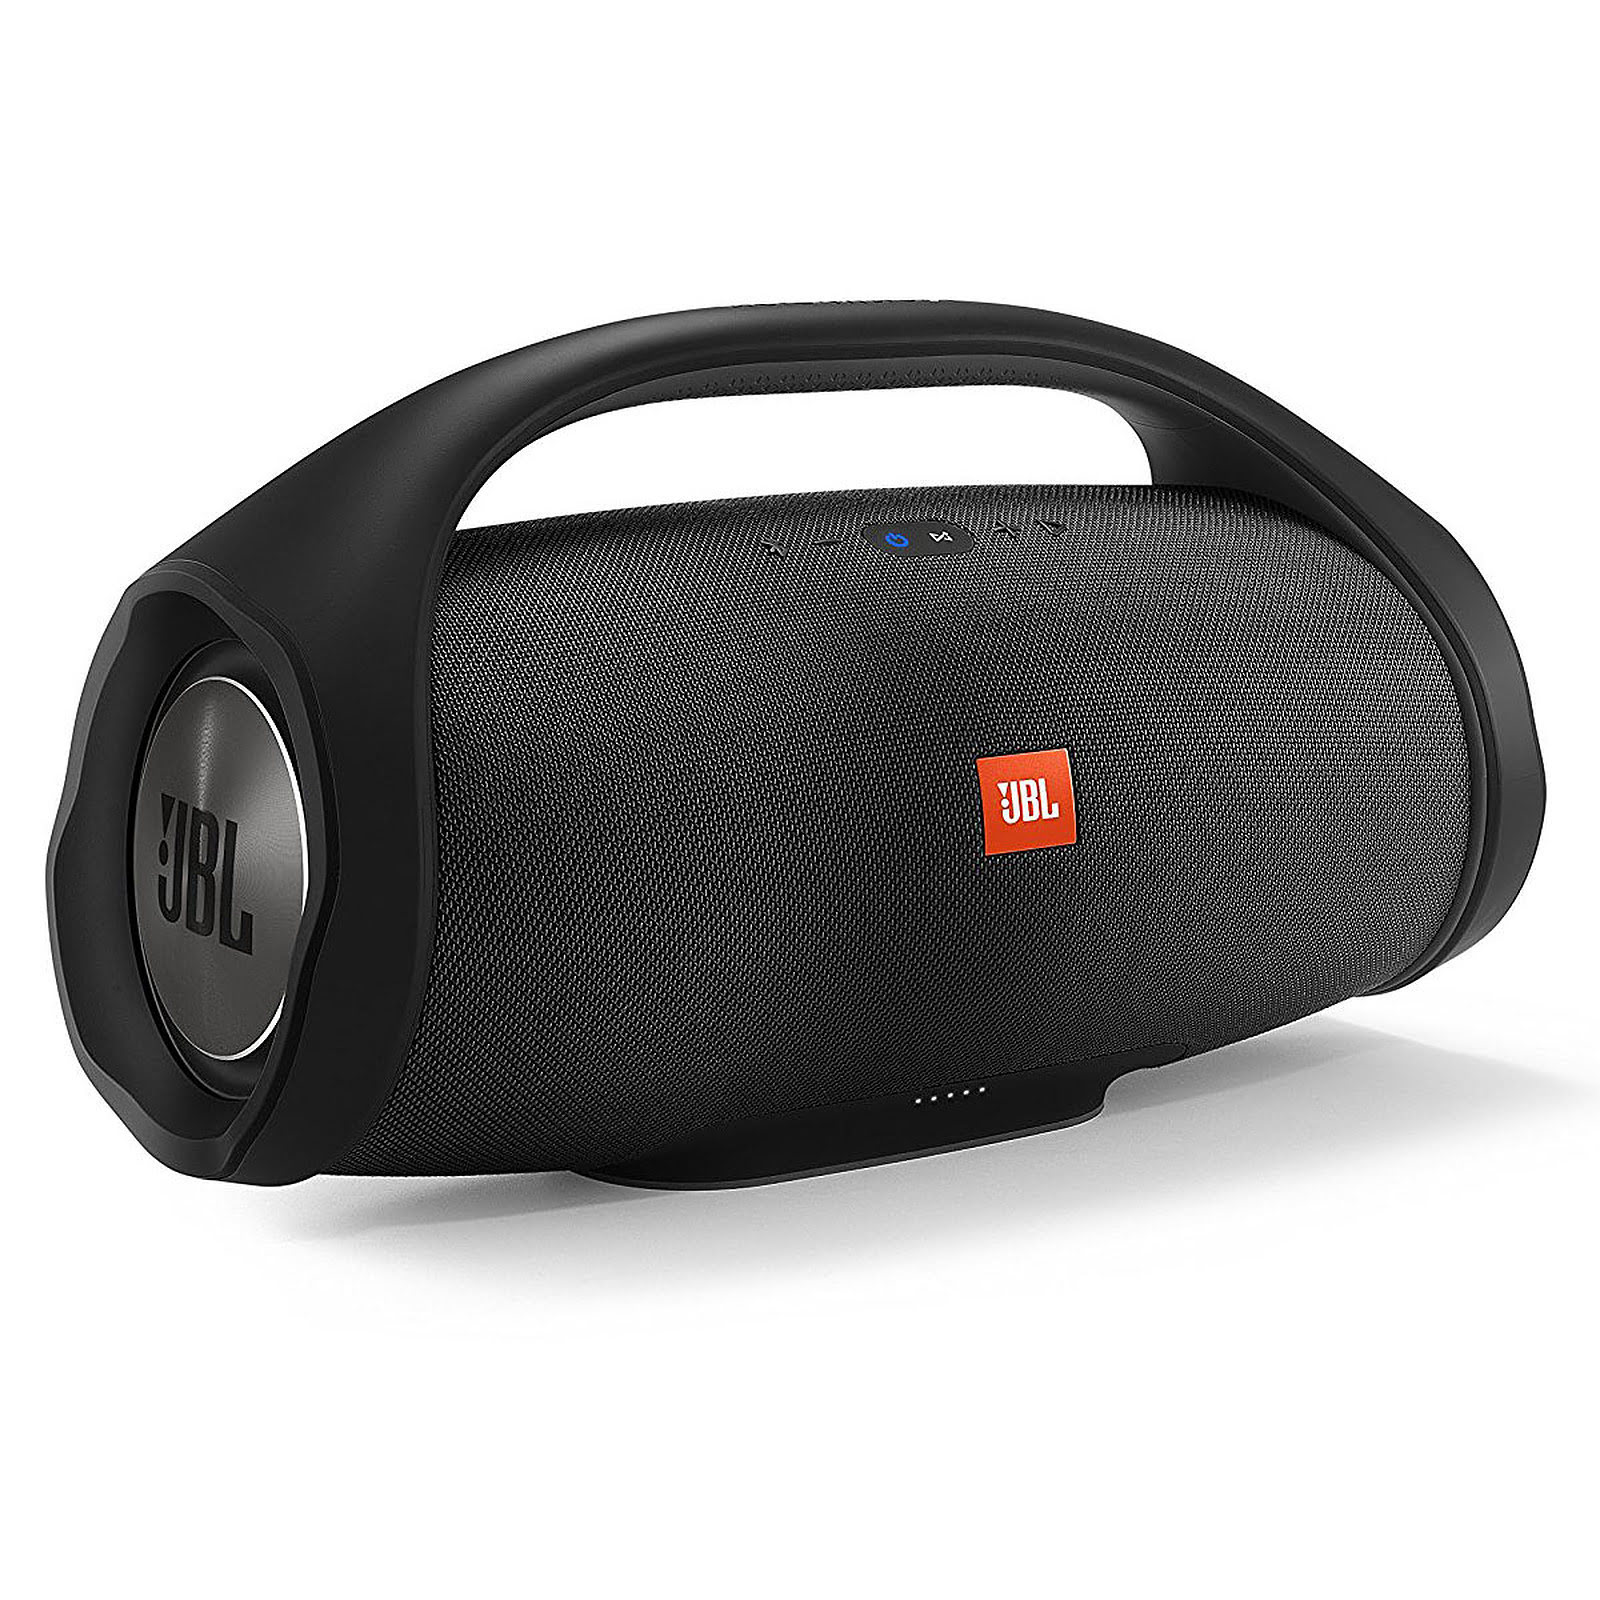 Boombox - Noir (JBLBOOMBOXBLKEU) - Achat / Vente Enceinte PC sur Picata.fr - 0